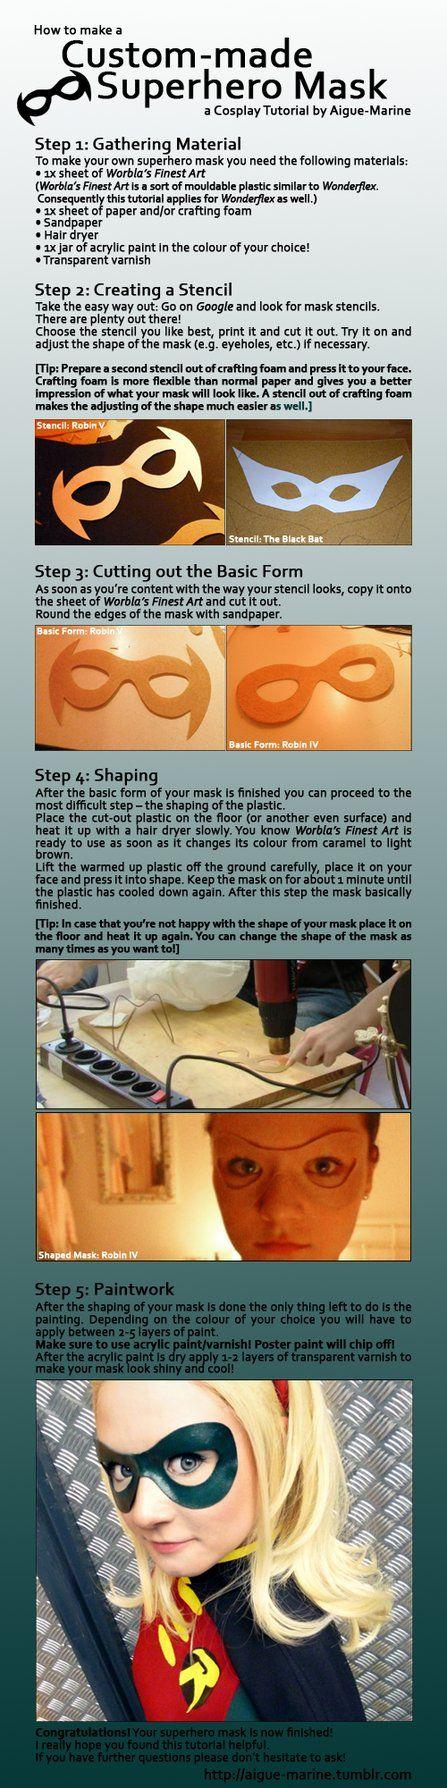 Tutorial: Custom-made Superhero Mask by Aigue-Marine